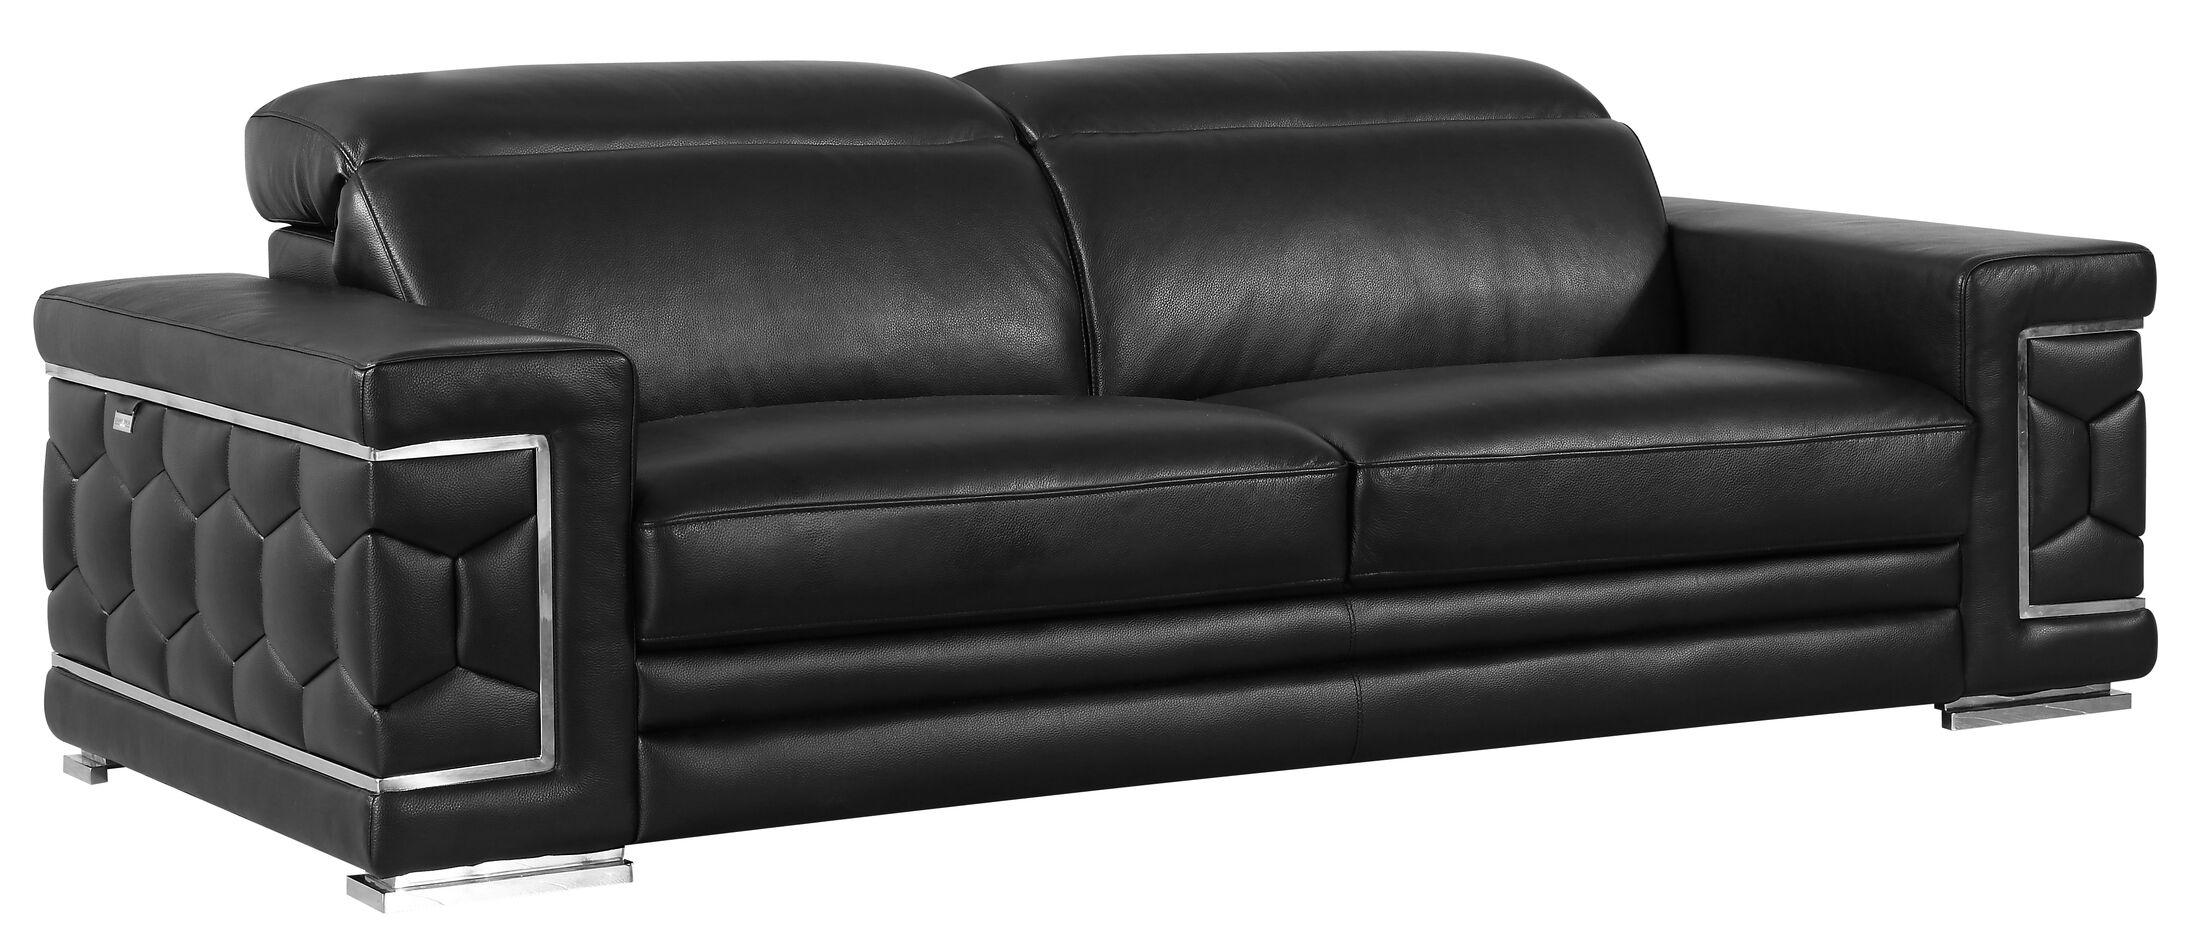 Hawkesbury Common Leather Sofa Upholstery: Black